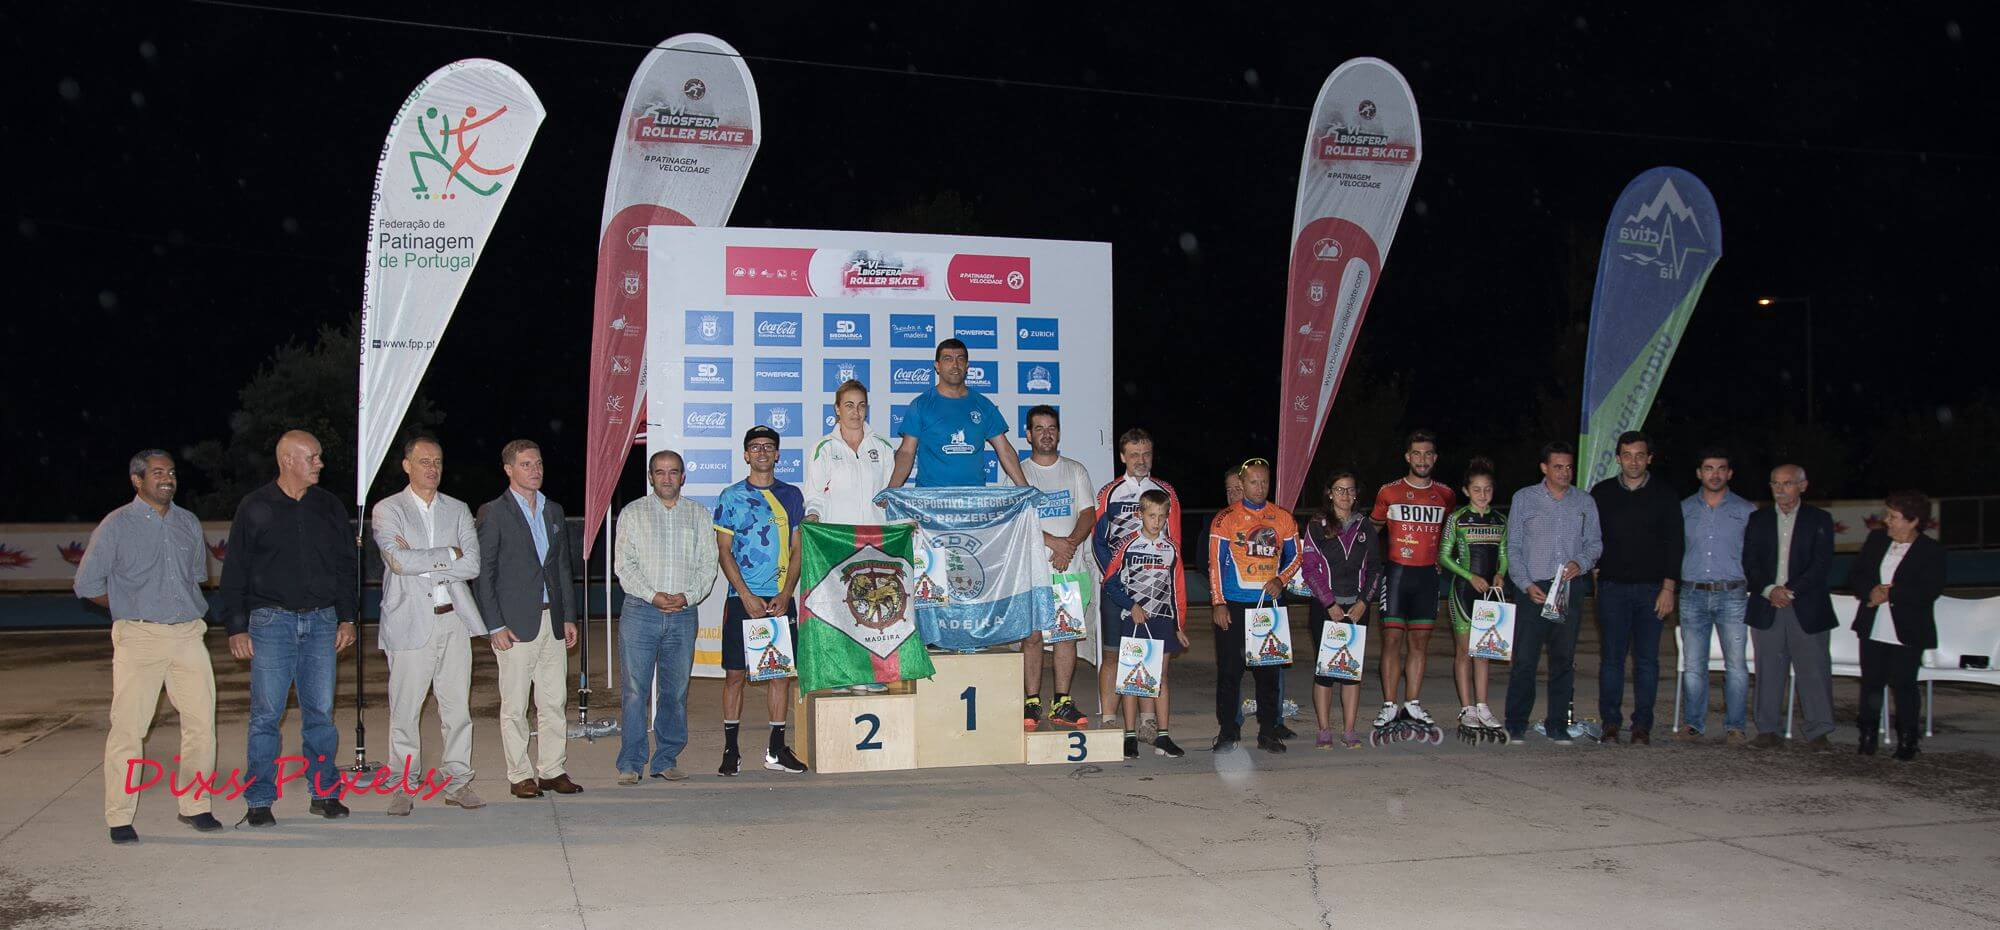 diogo vence  biosfera e maratona do funchal Diogo vence  Biosfera e Maratona do Funchal P  dio Clubes RL 6